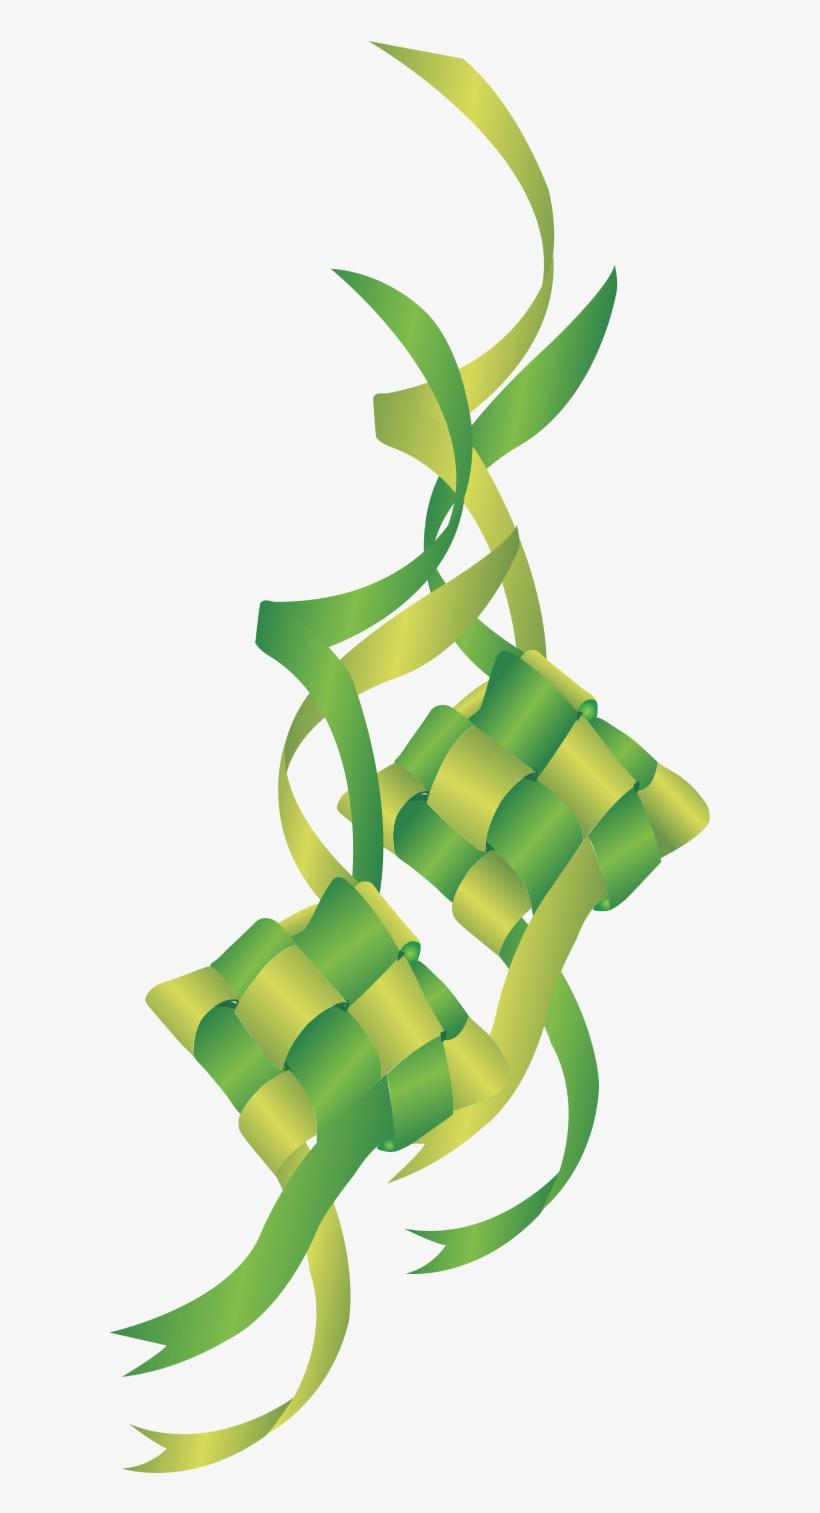 Logo Ketupat Png : ketupat, Vector, Ketupat, Ketupan, Transparent, Download, PNGkey